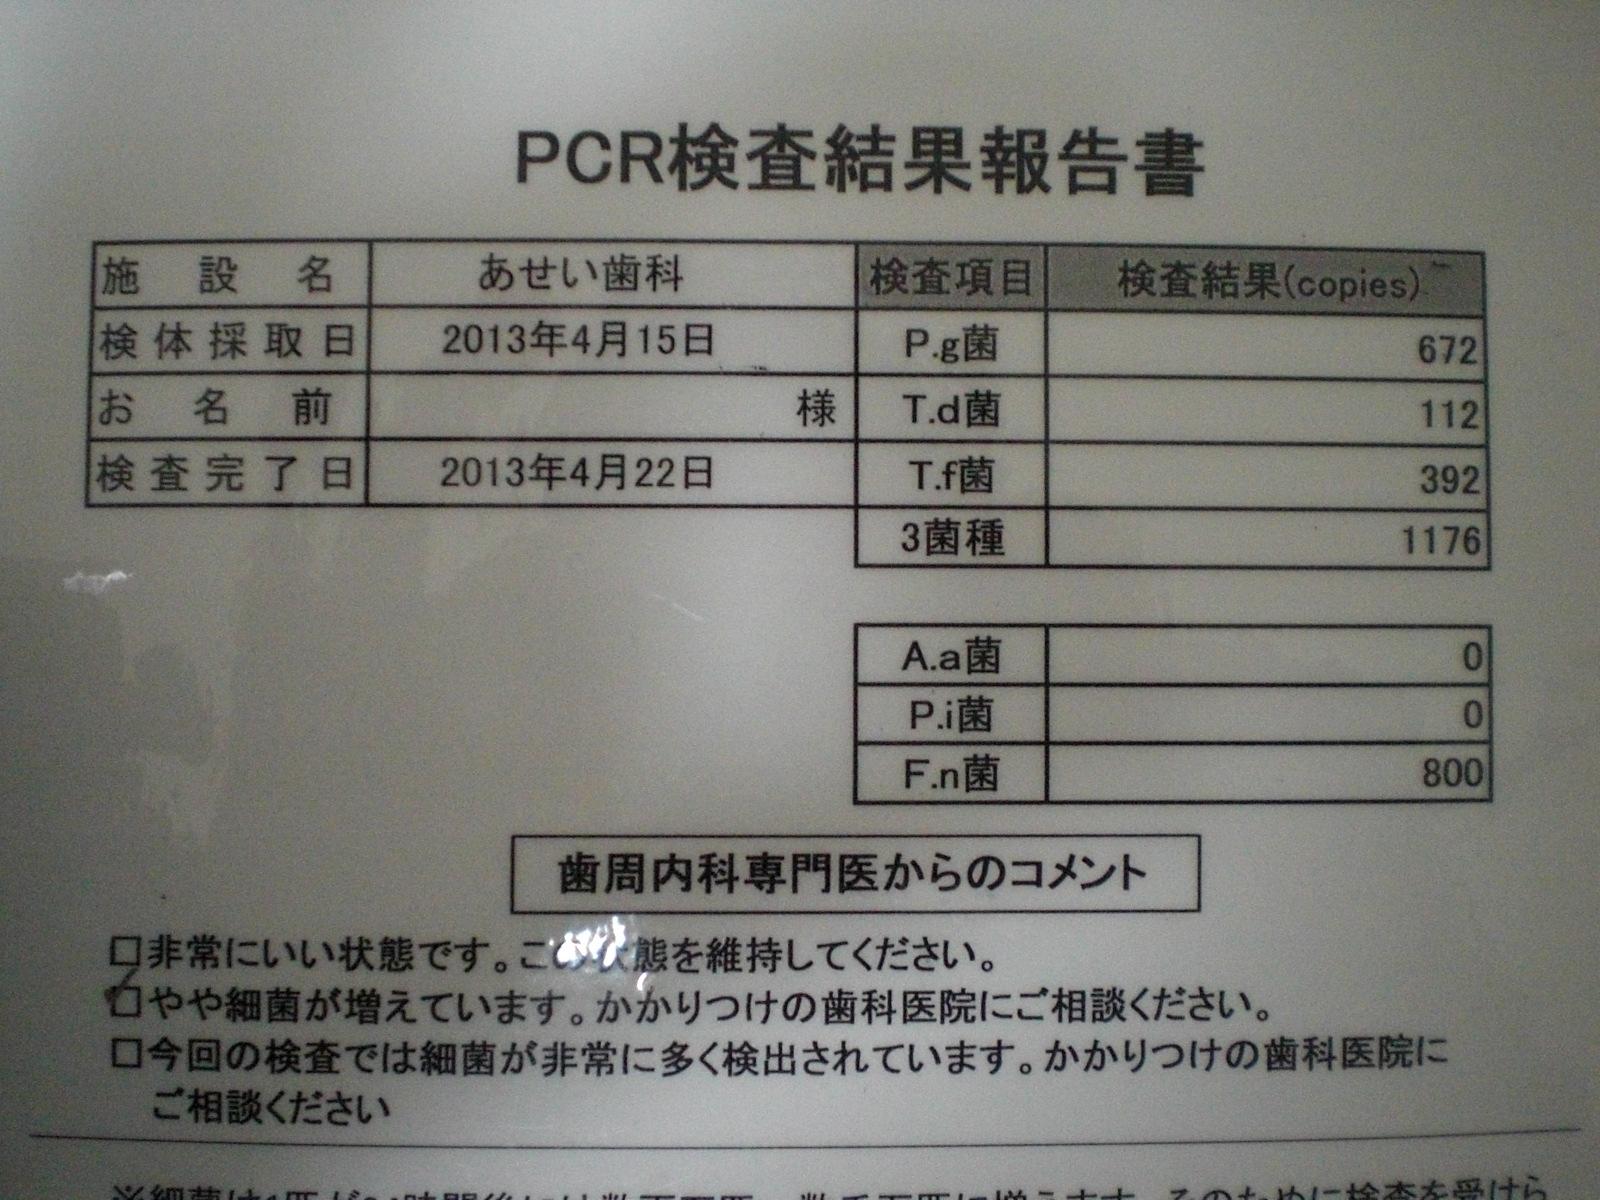 PCR歯周病菌検査